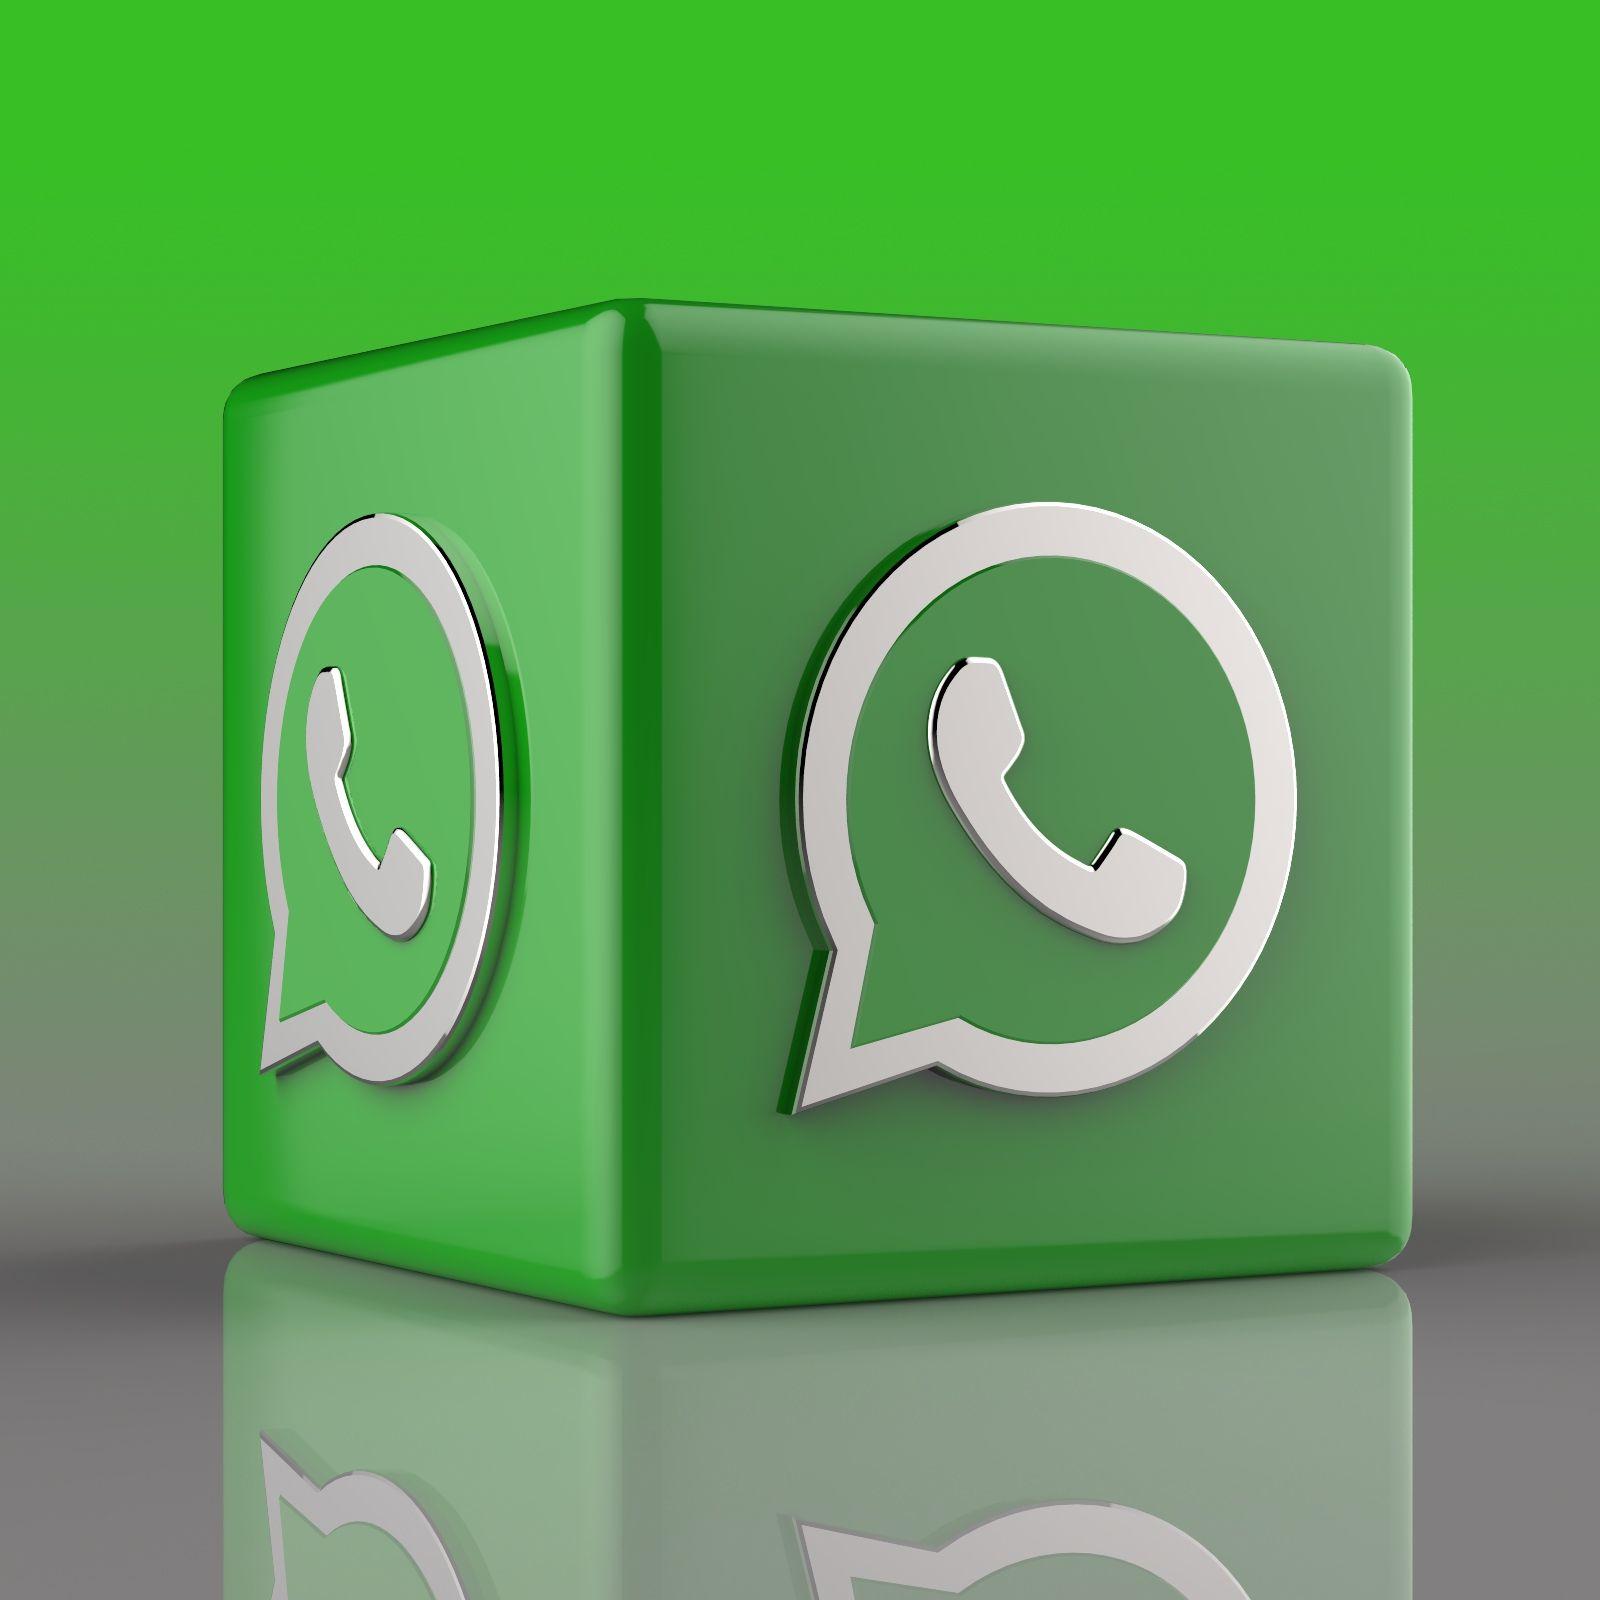 Whatsapp Logo Whatsapp, Logo Logos, Logo design